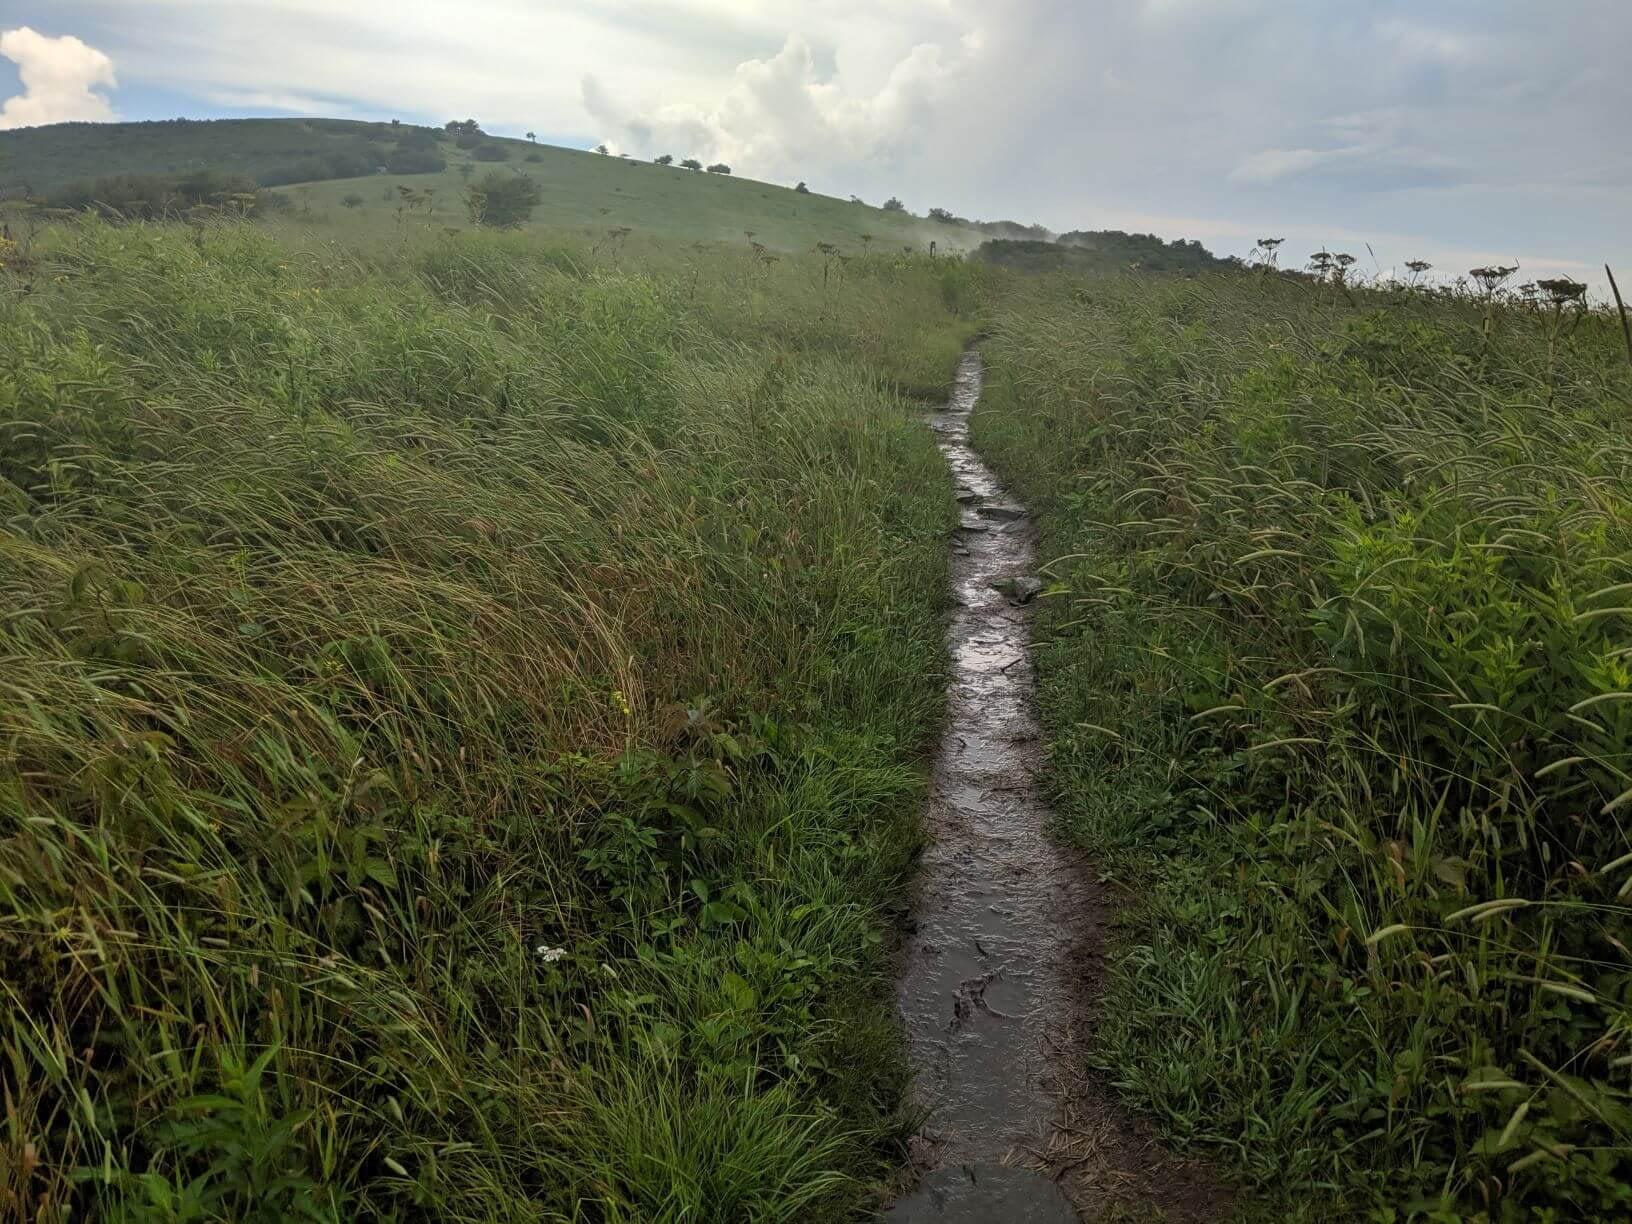 The Appalachian Trail through the Roan Highlands